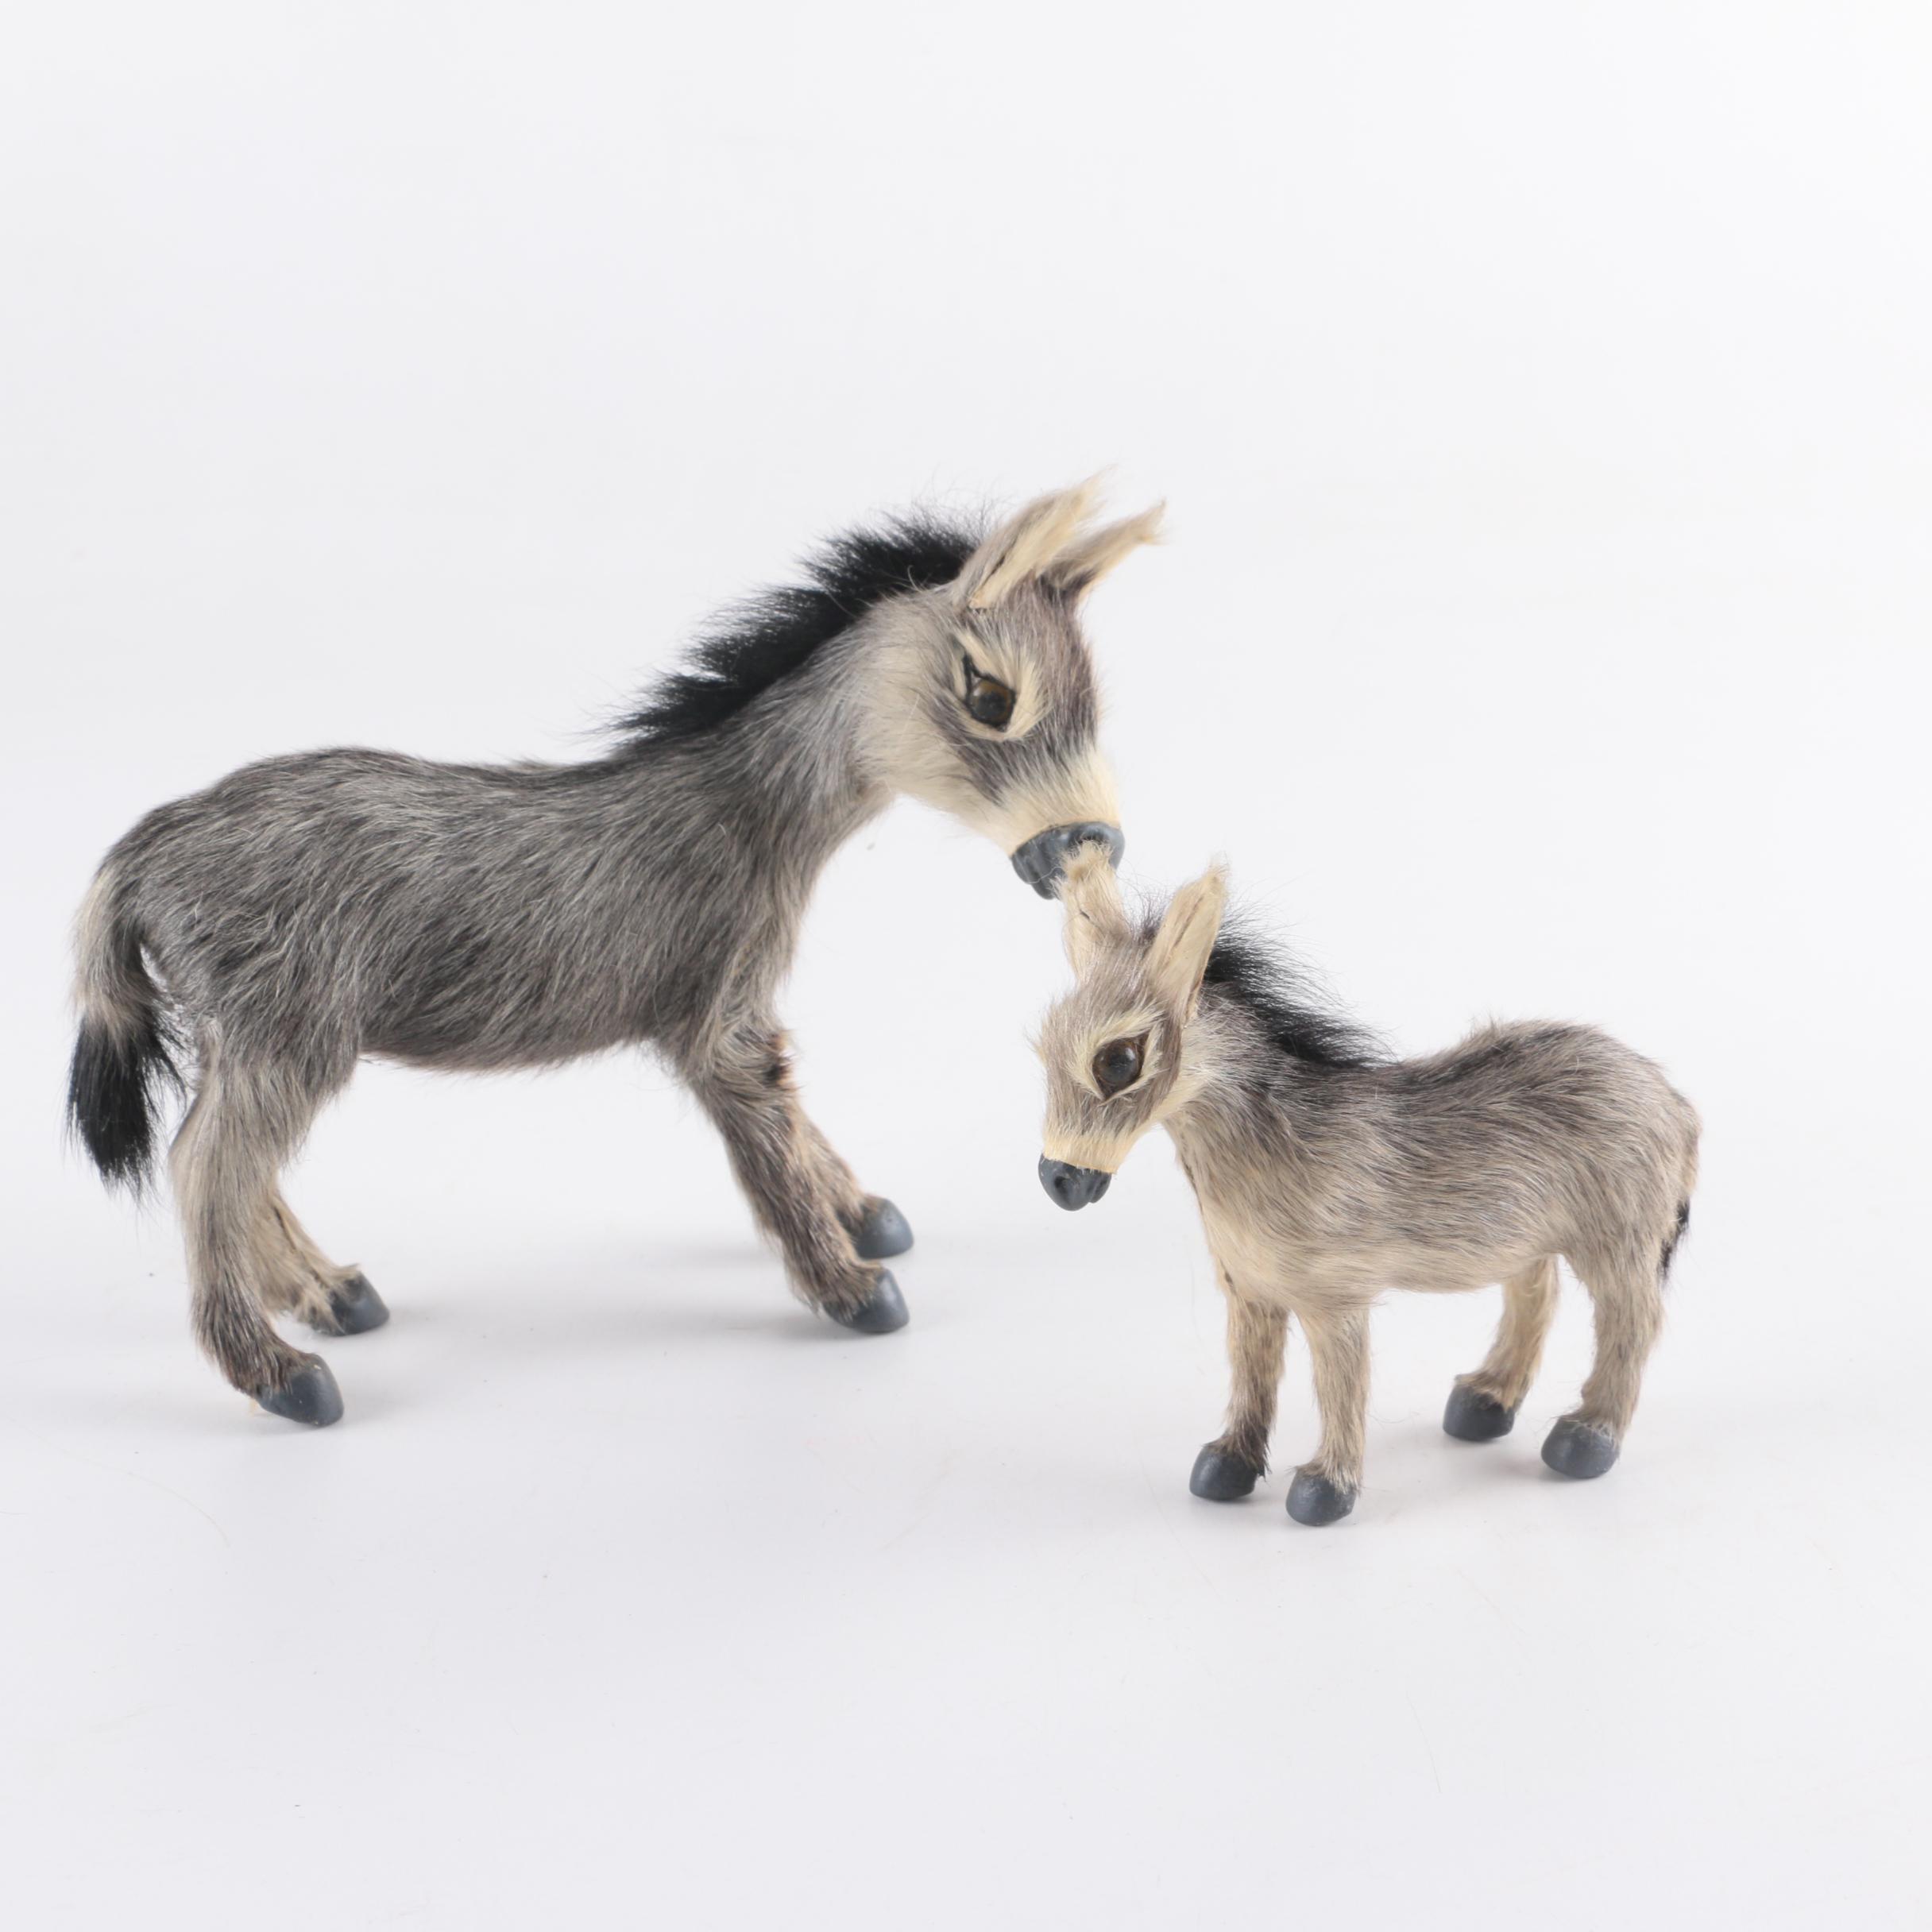 Donkey Figurines